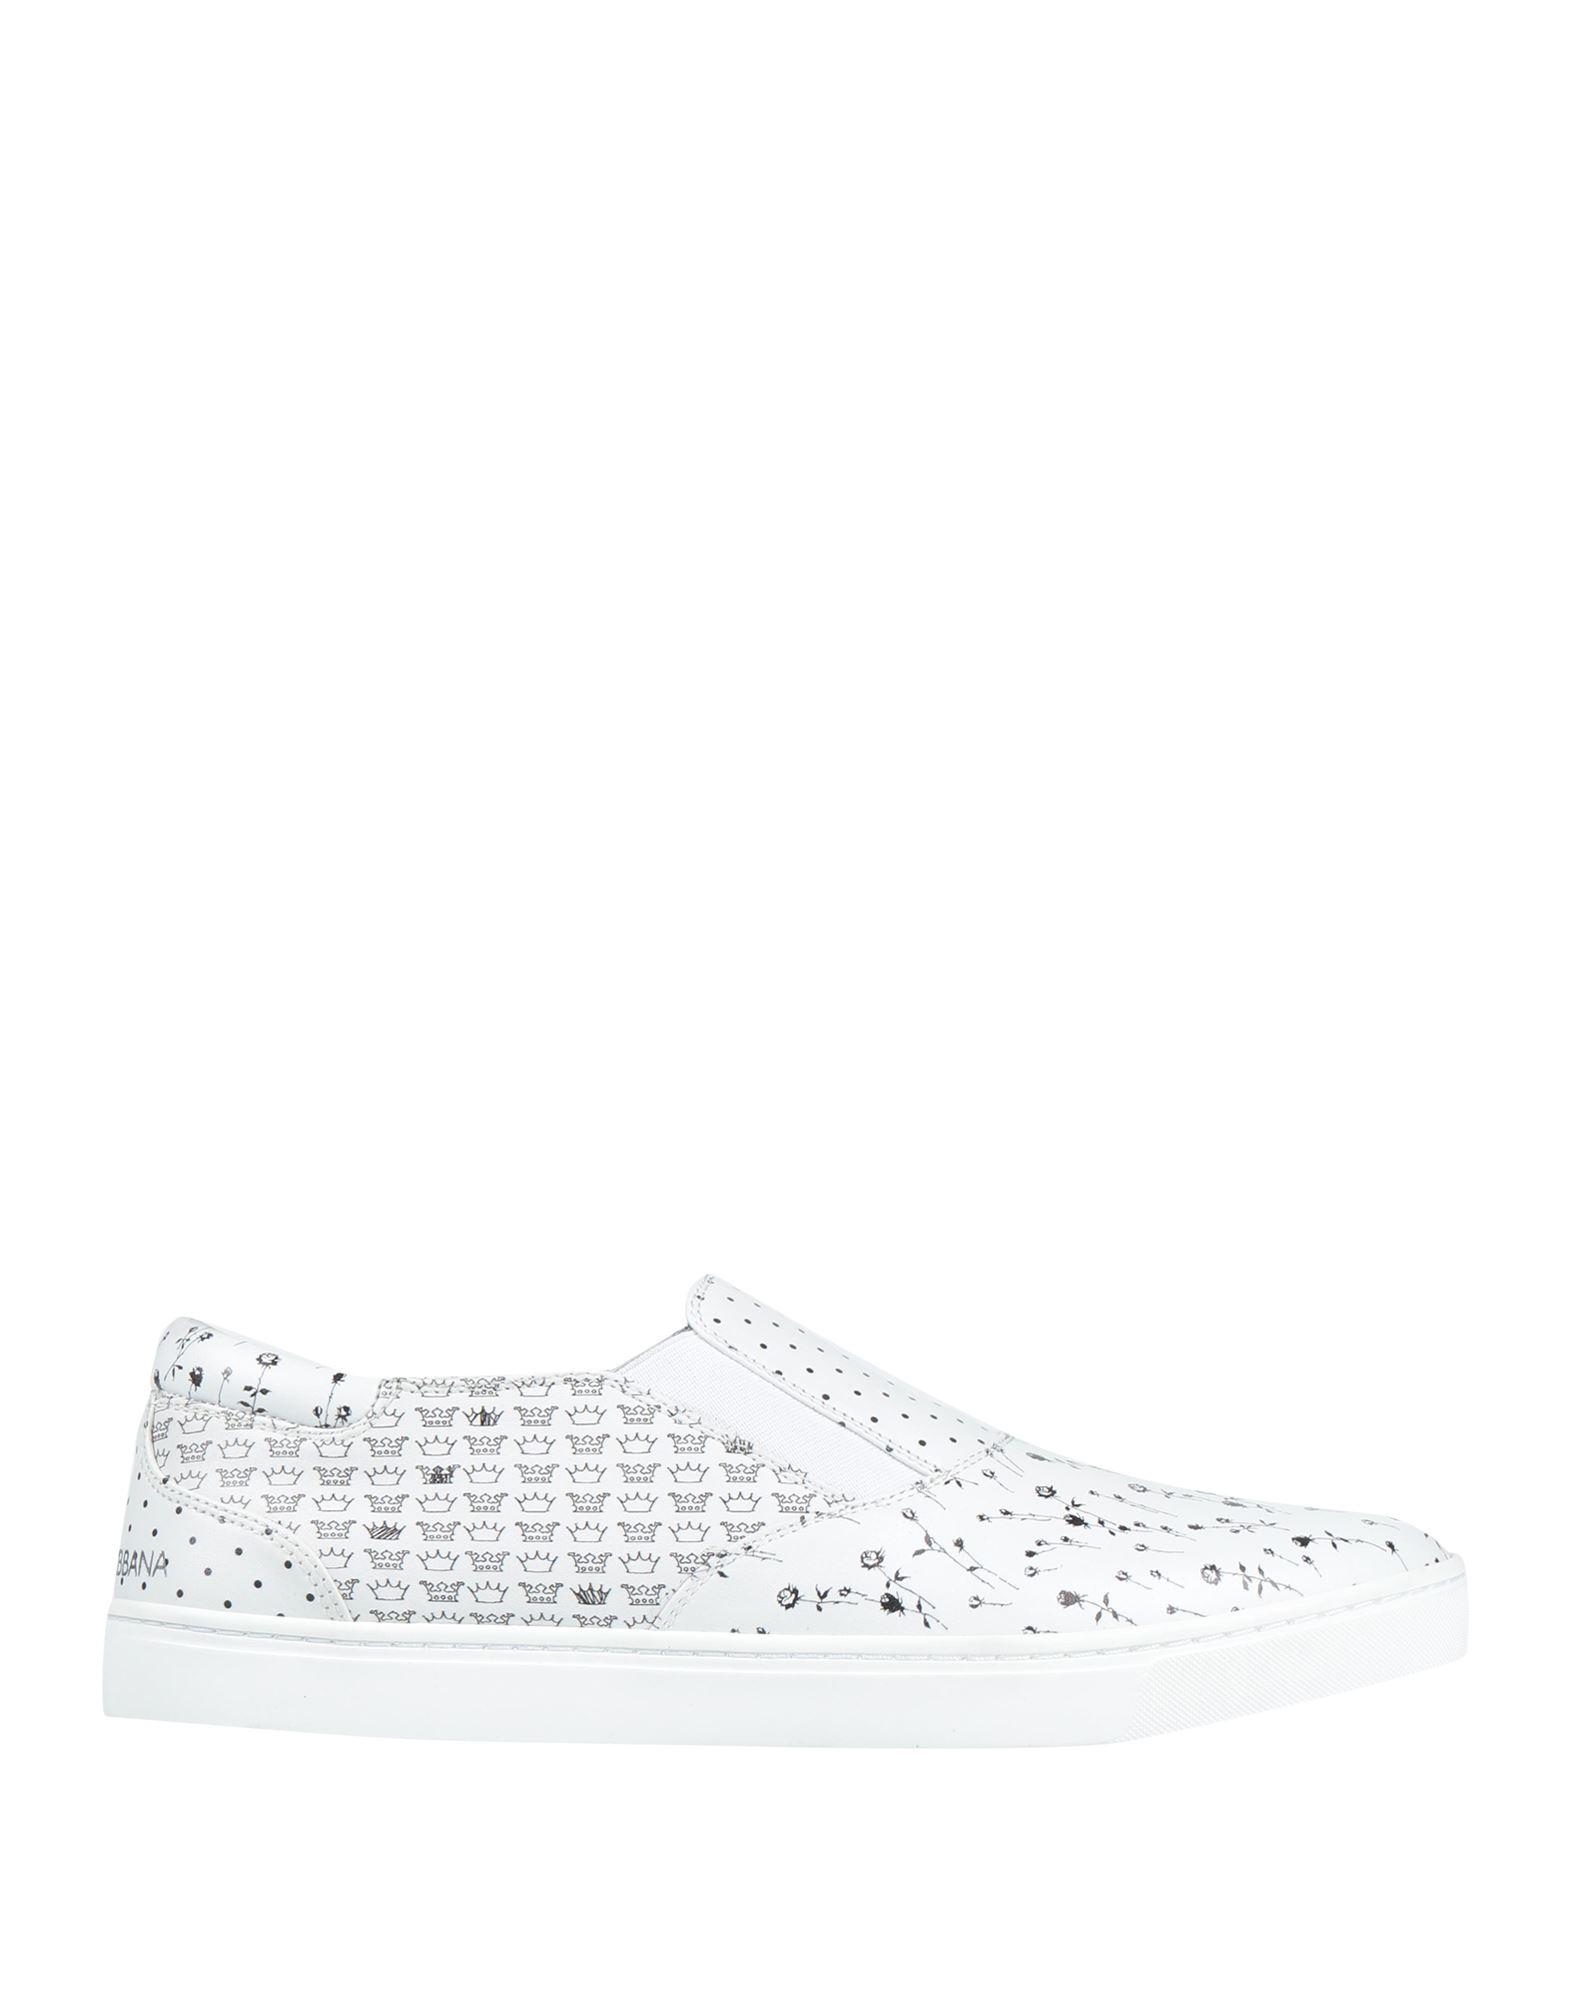 Dolce & Gabbana Sneakers Herren  11473351FD Gute Qualität beliebte Schuhe